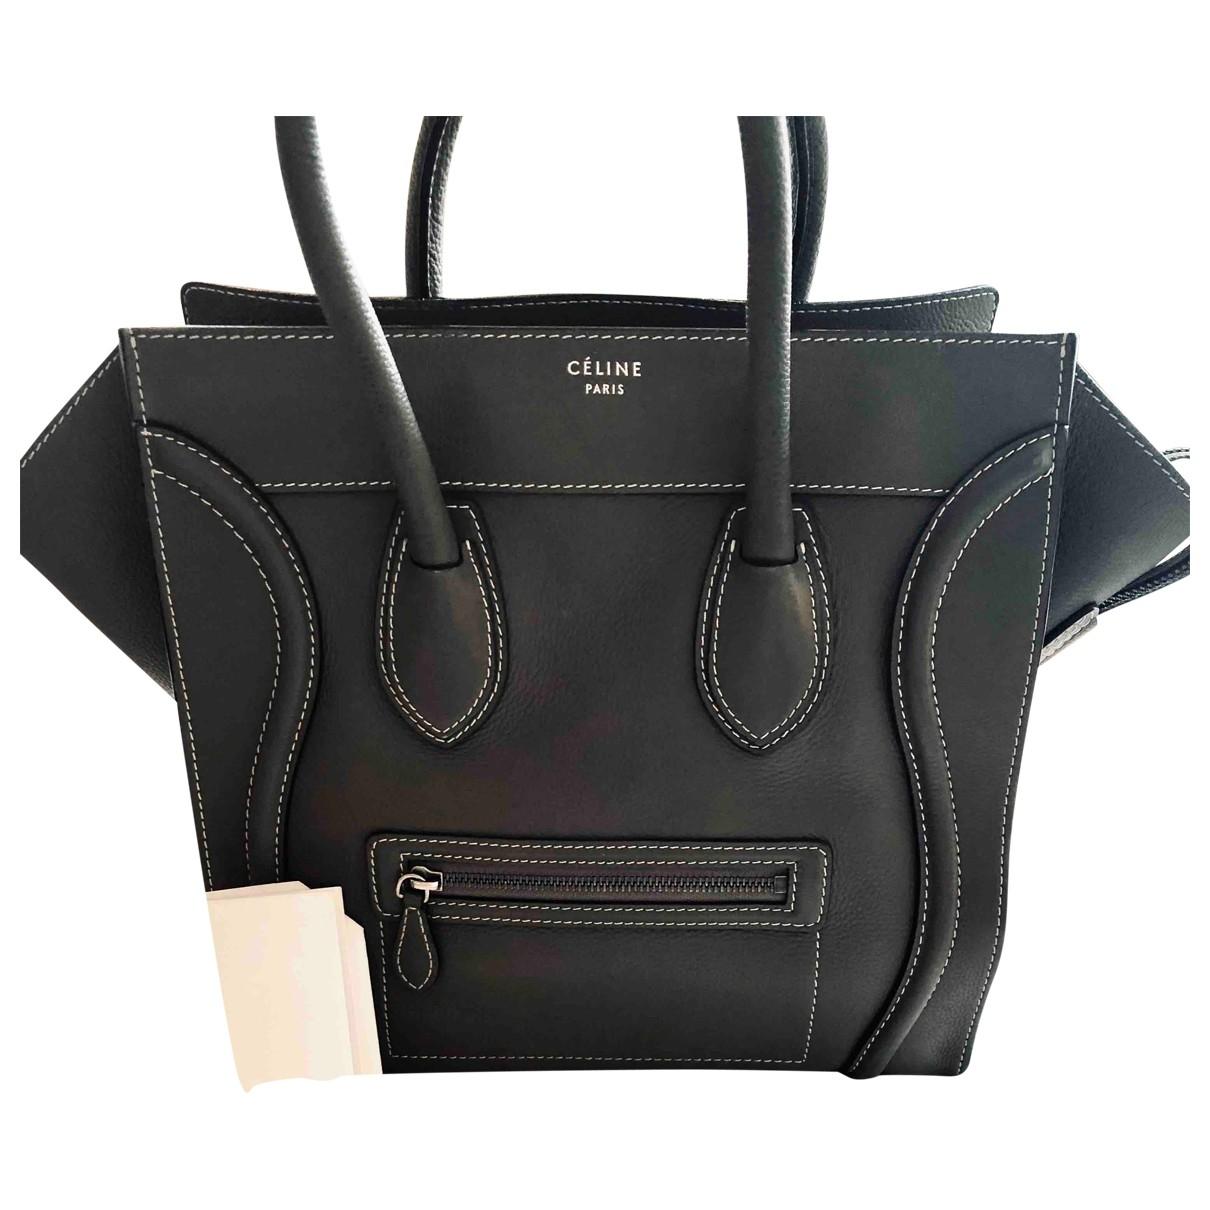 Celine Luggage Handtasche in  Khaki Leder